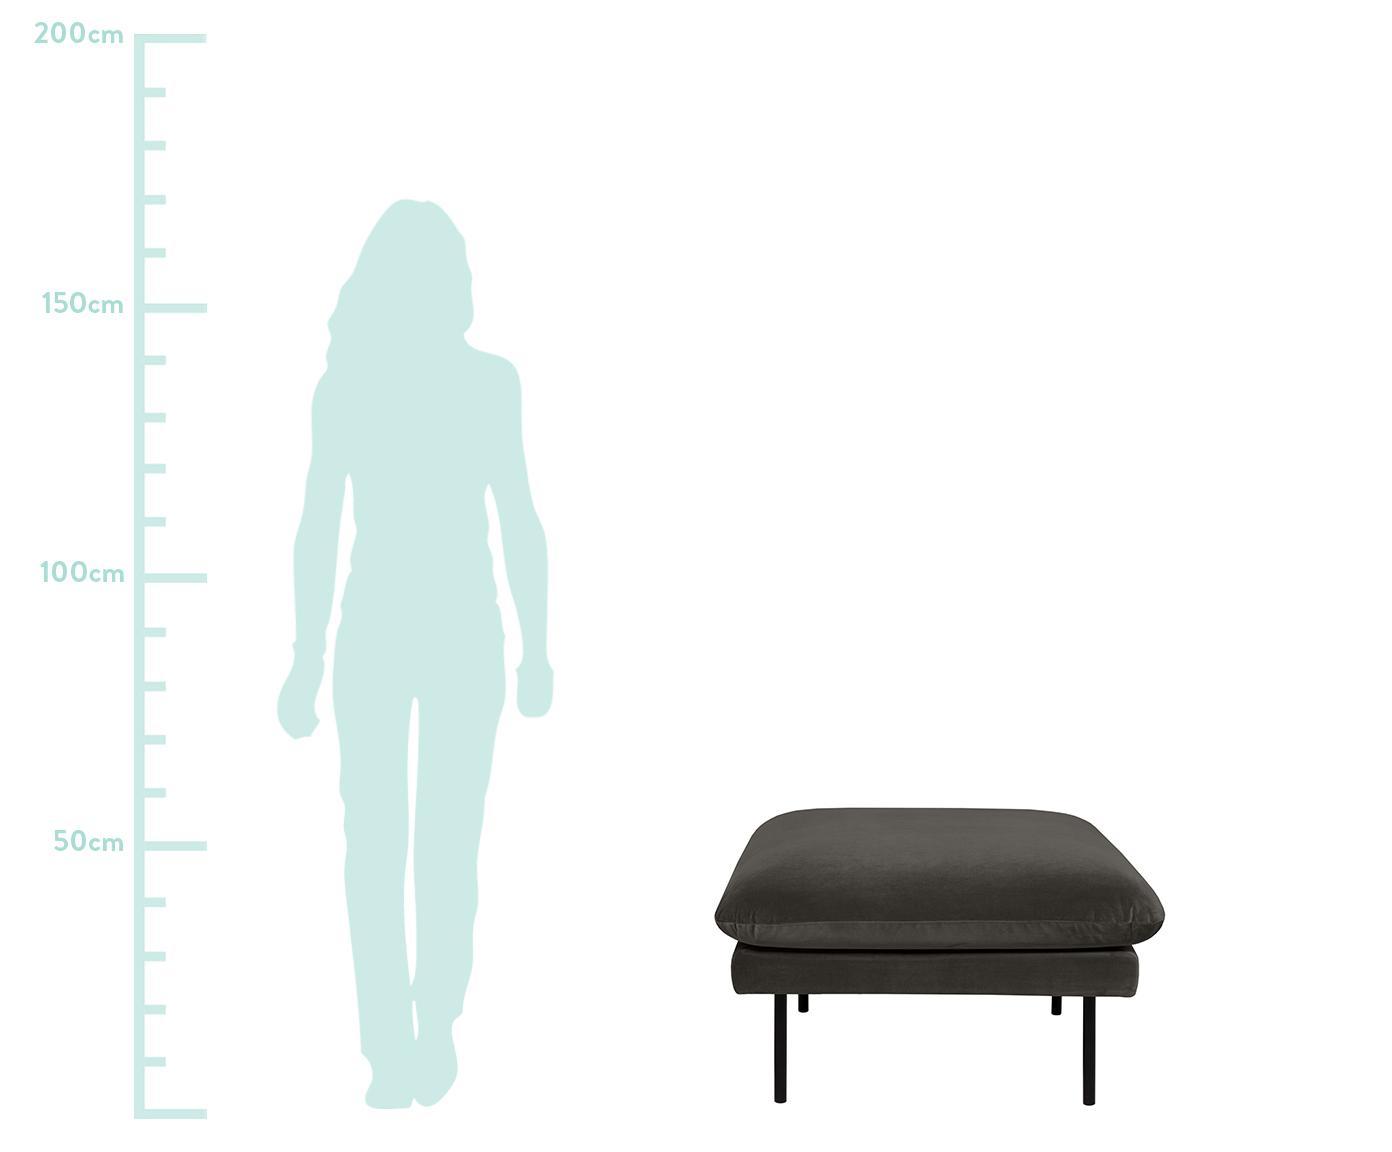 Sofa-Hocker Moby aus Samt, Bezug: Samt (Hochwertiger Polyes, Gestell: Massives Kiefernholz, Füße: Metall, pulverbeschichtet, Samt Braungrau, 78 x 48 cm